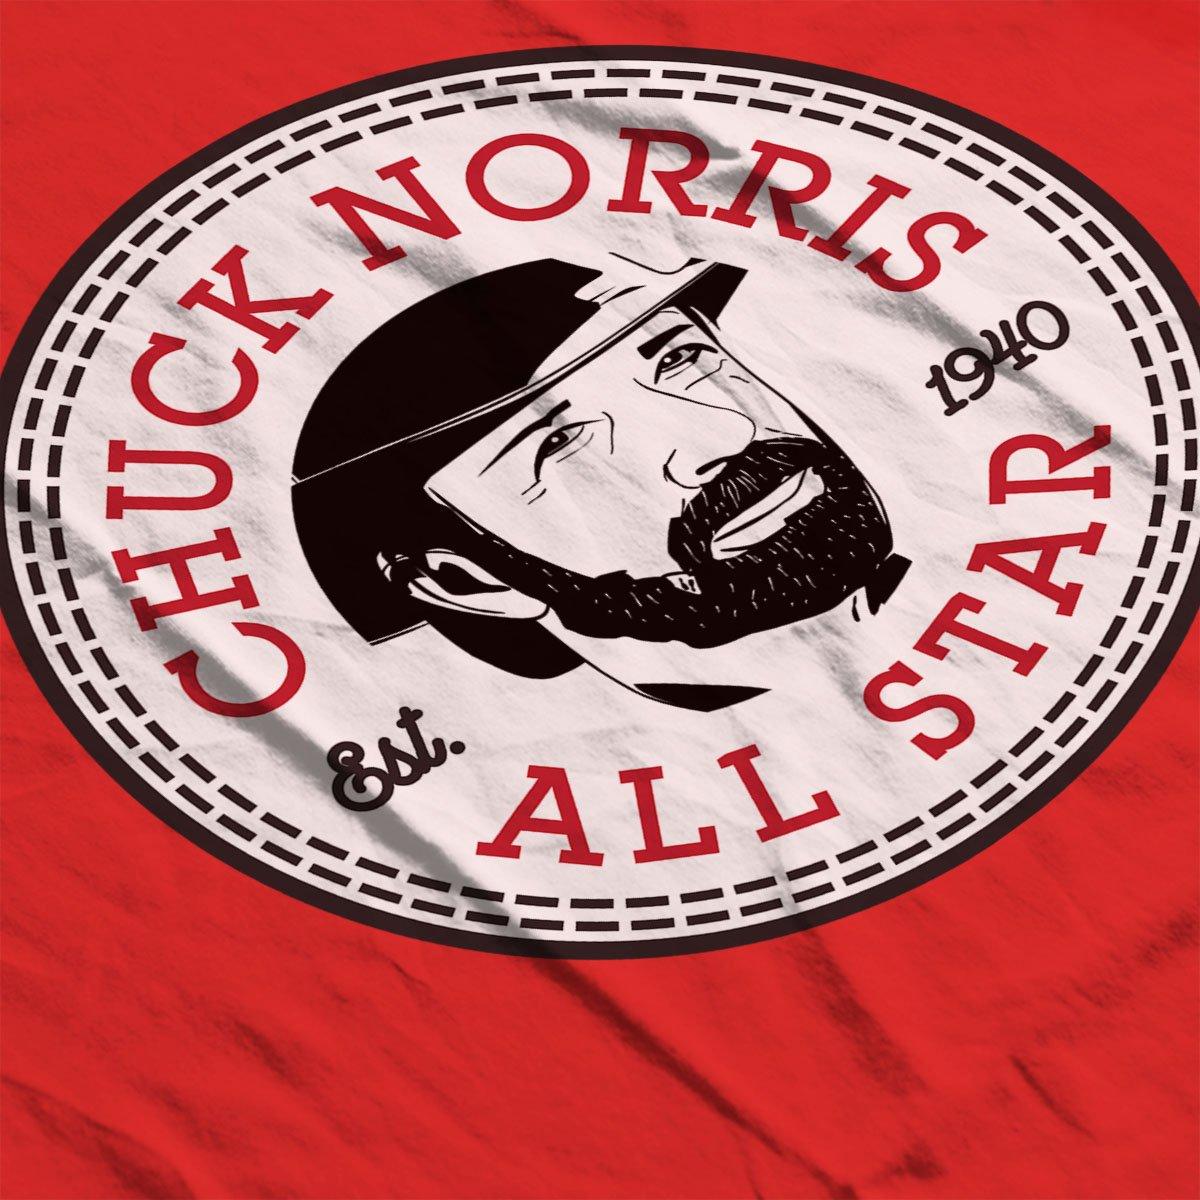 a8d1f5d64404 Chuck Norris All Star Converse Logo Men s T-Shirt  Amazon.co.uk  Clothing